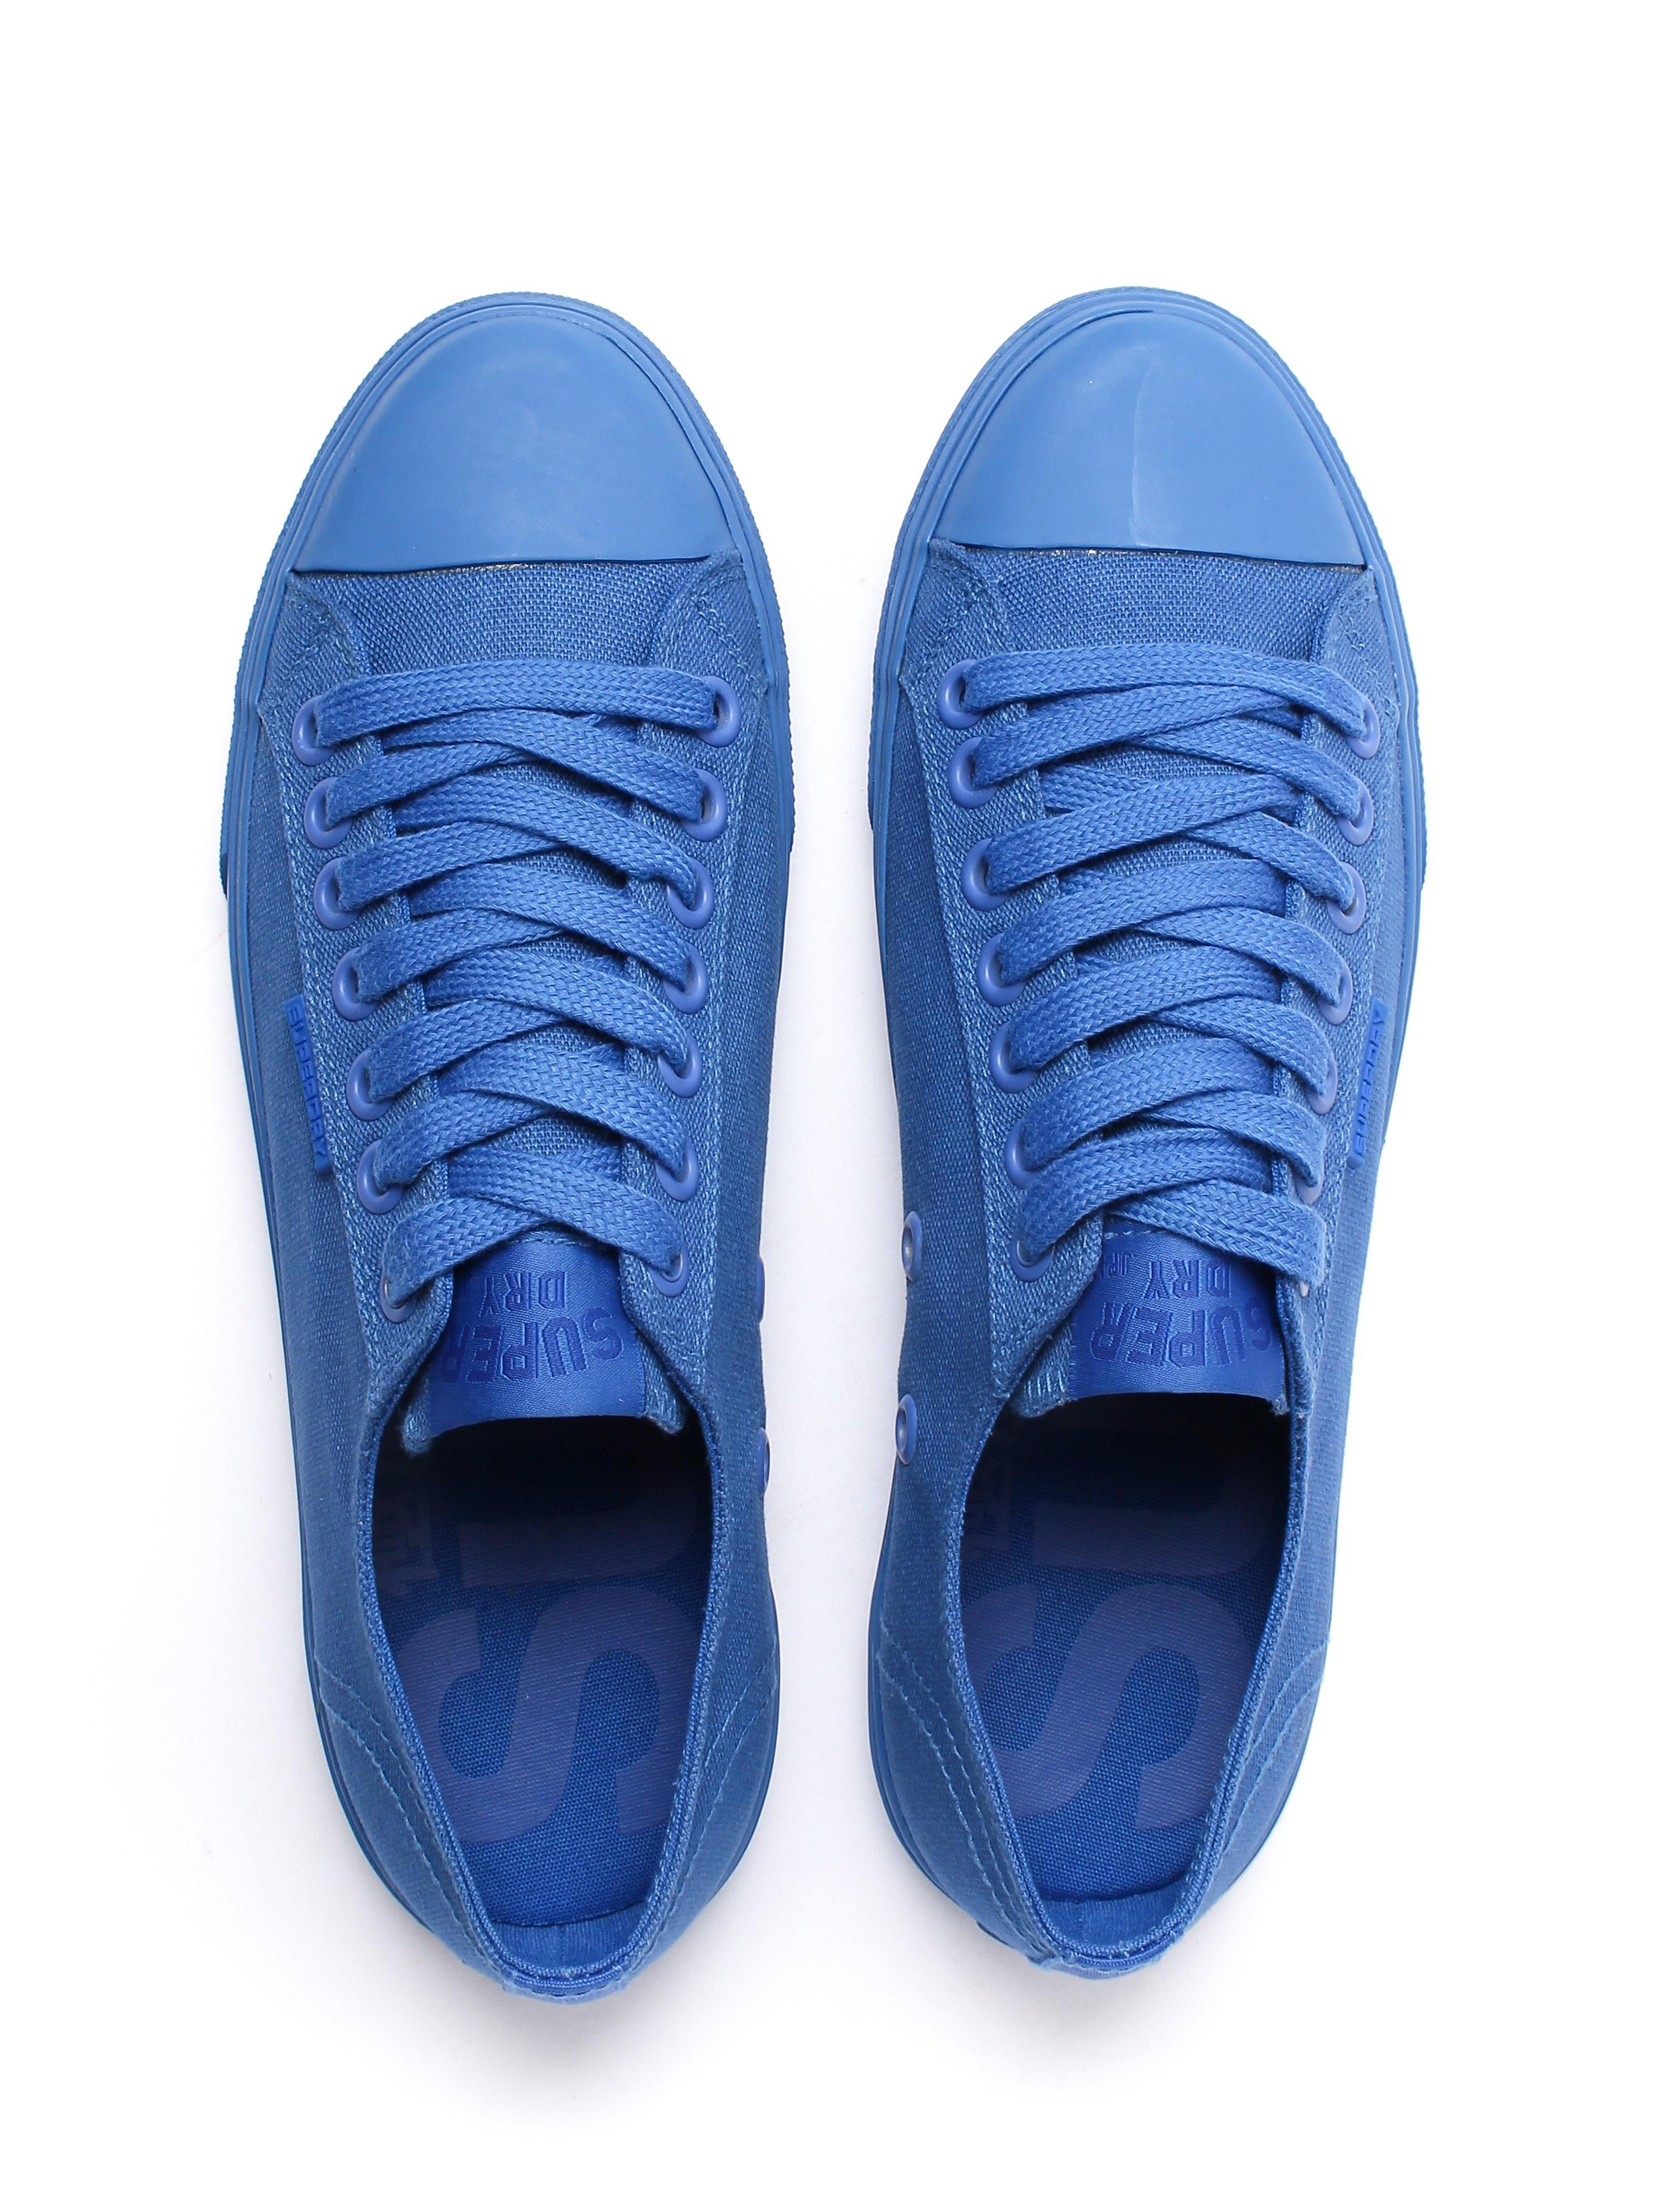 Superdry Men's Low Pro Sleek Mono Canvas Trainers - Nautical Blue